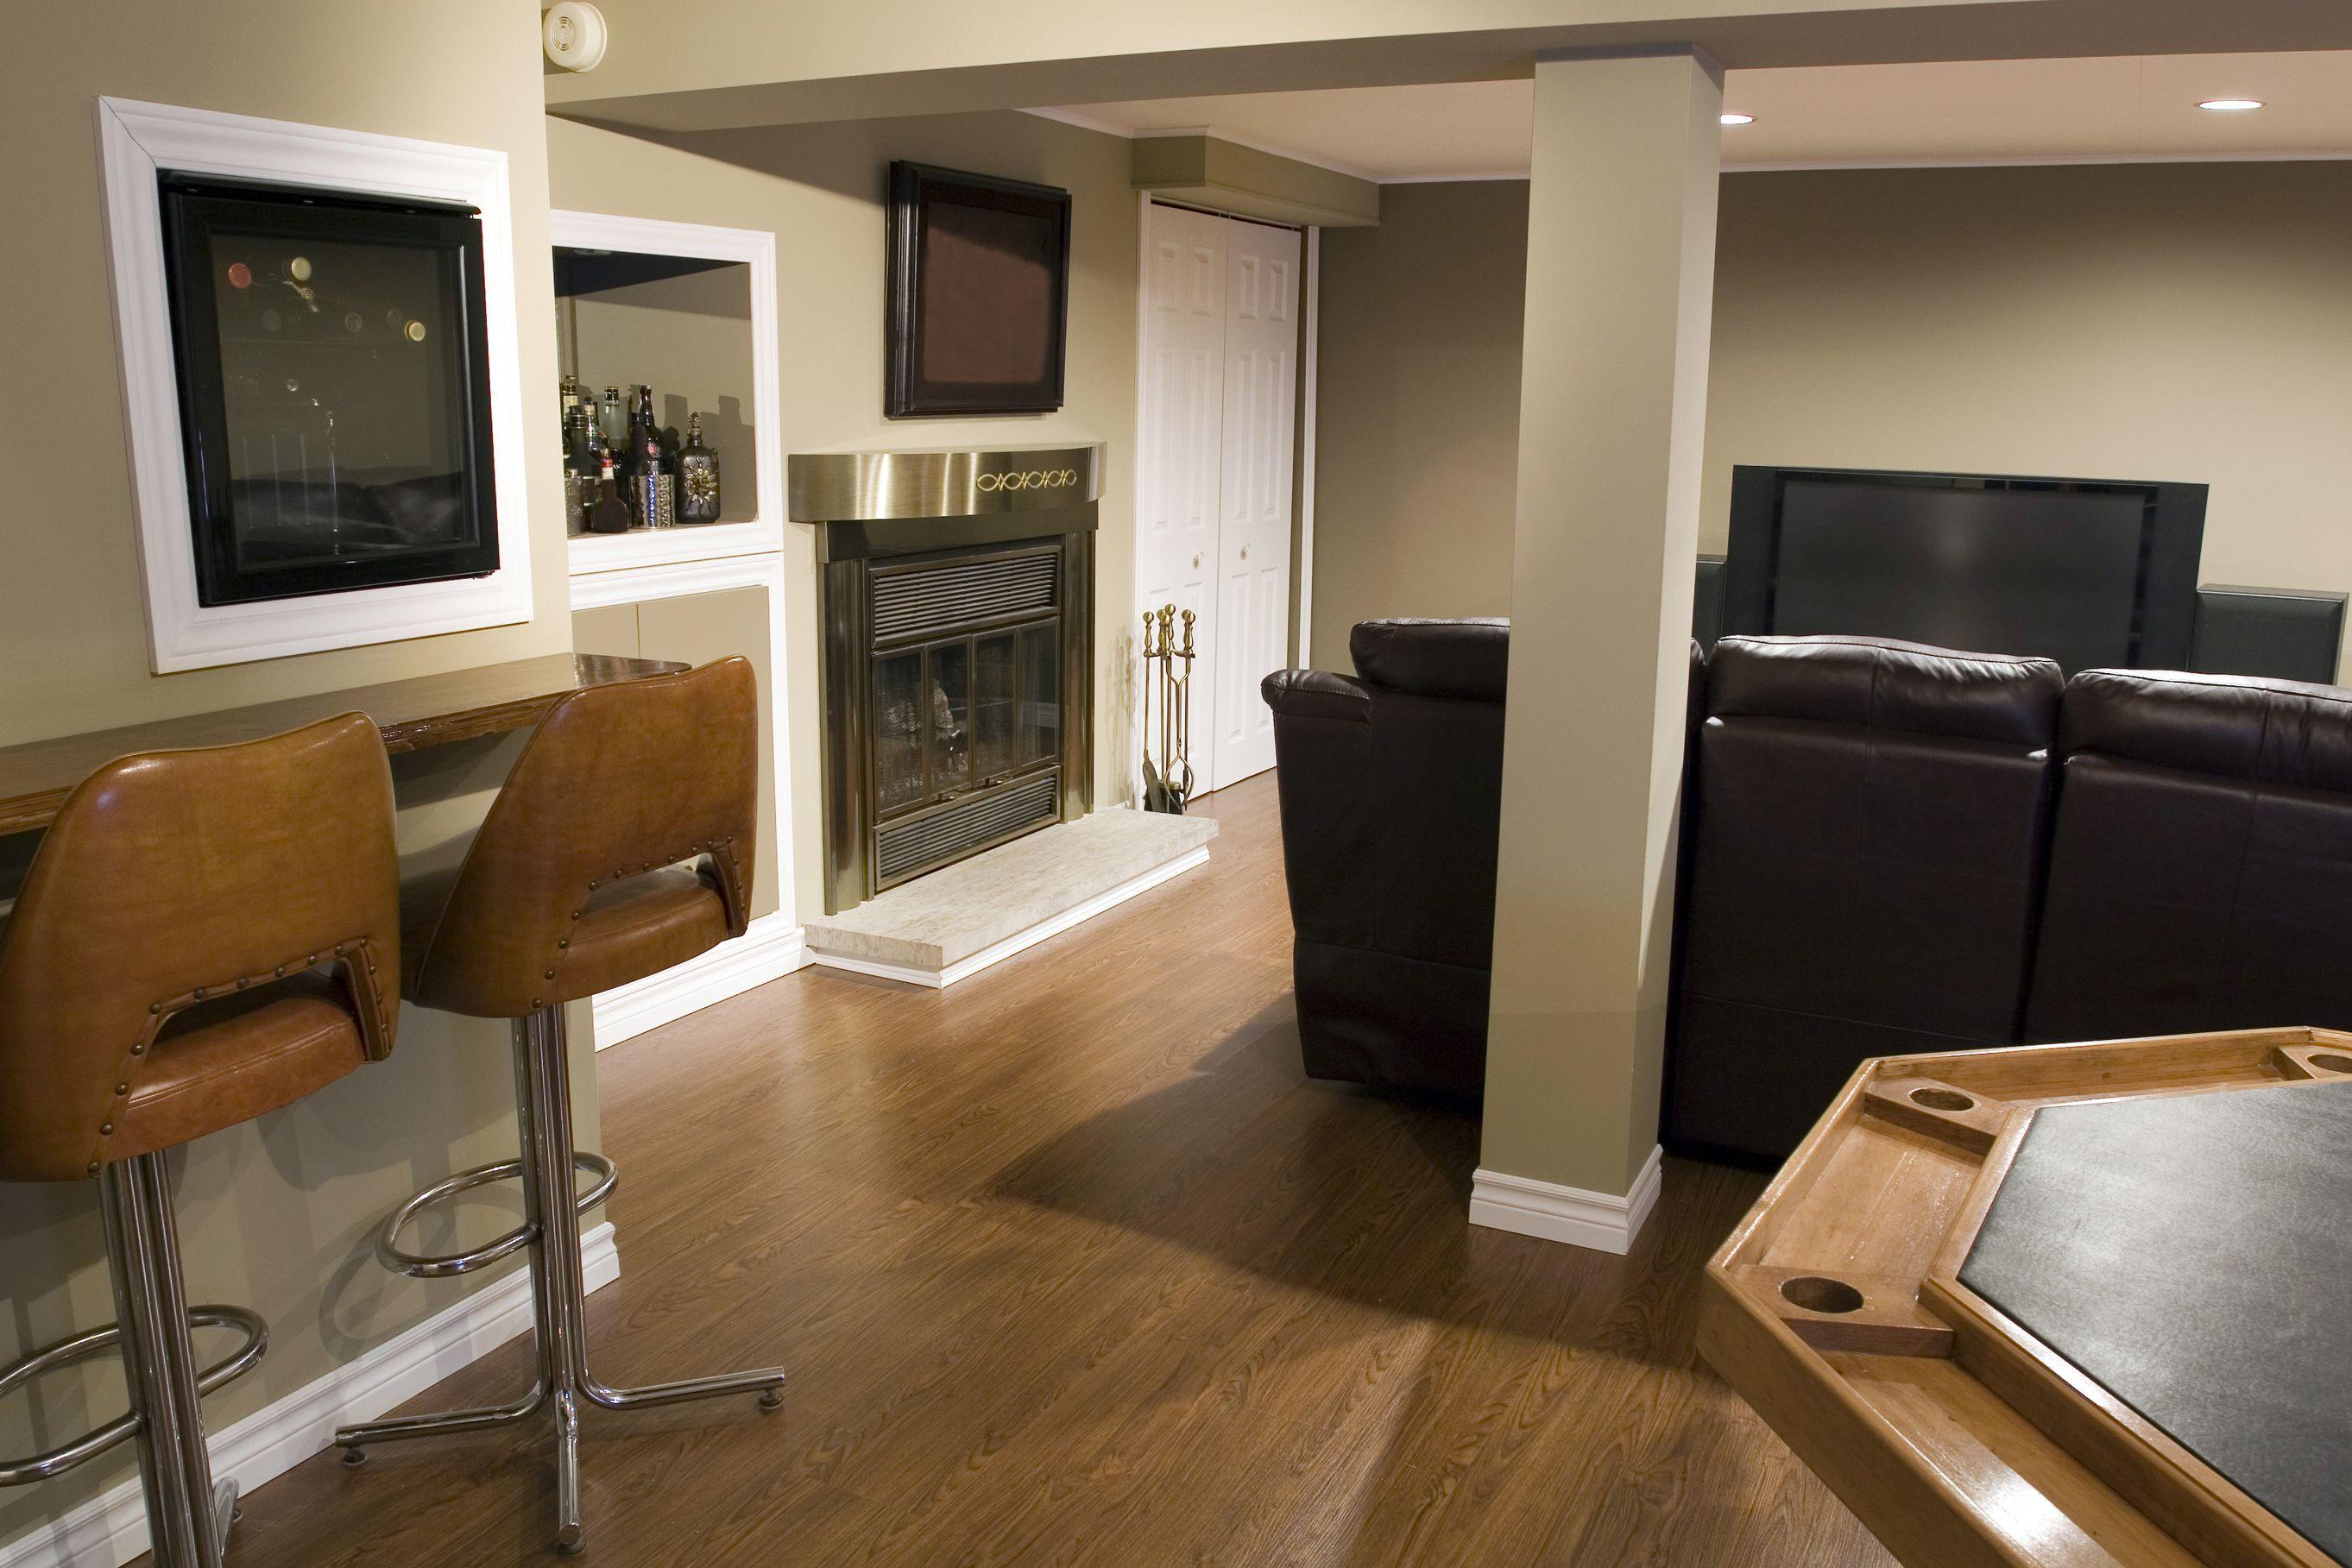 hardwood floor on cement slab of best basement flooring options throughout basementflooring 5bb76ea04cedfd00261522e8